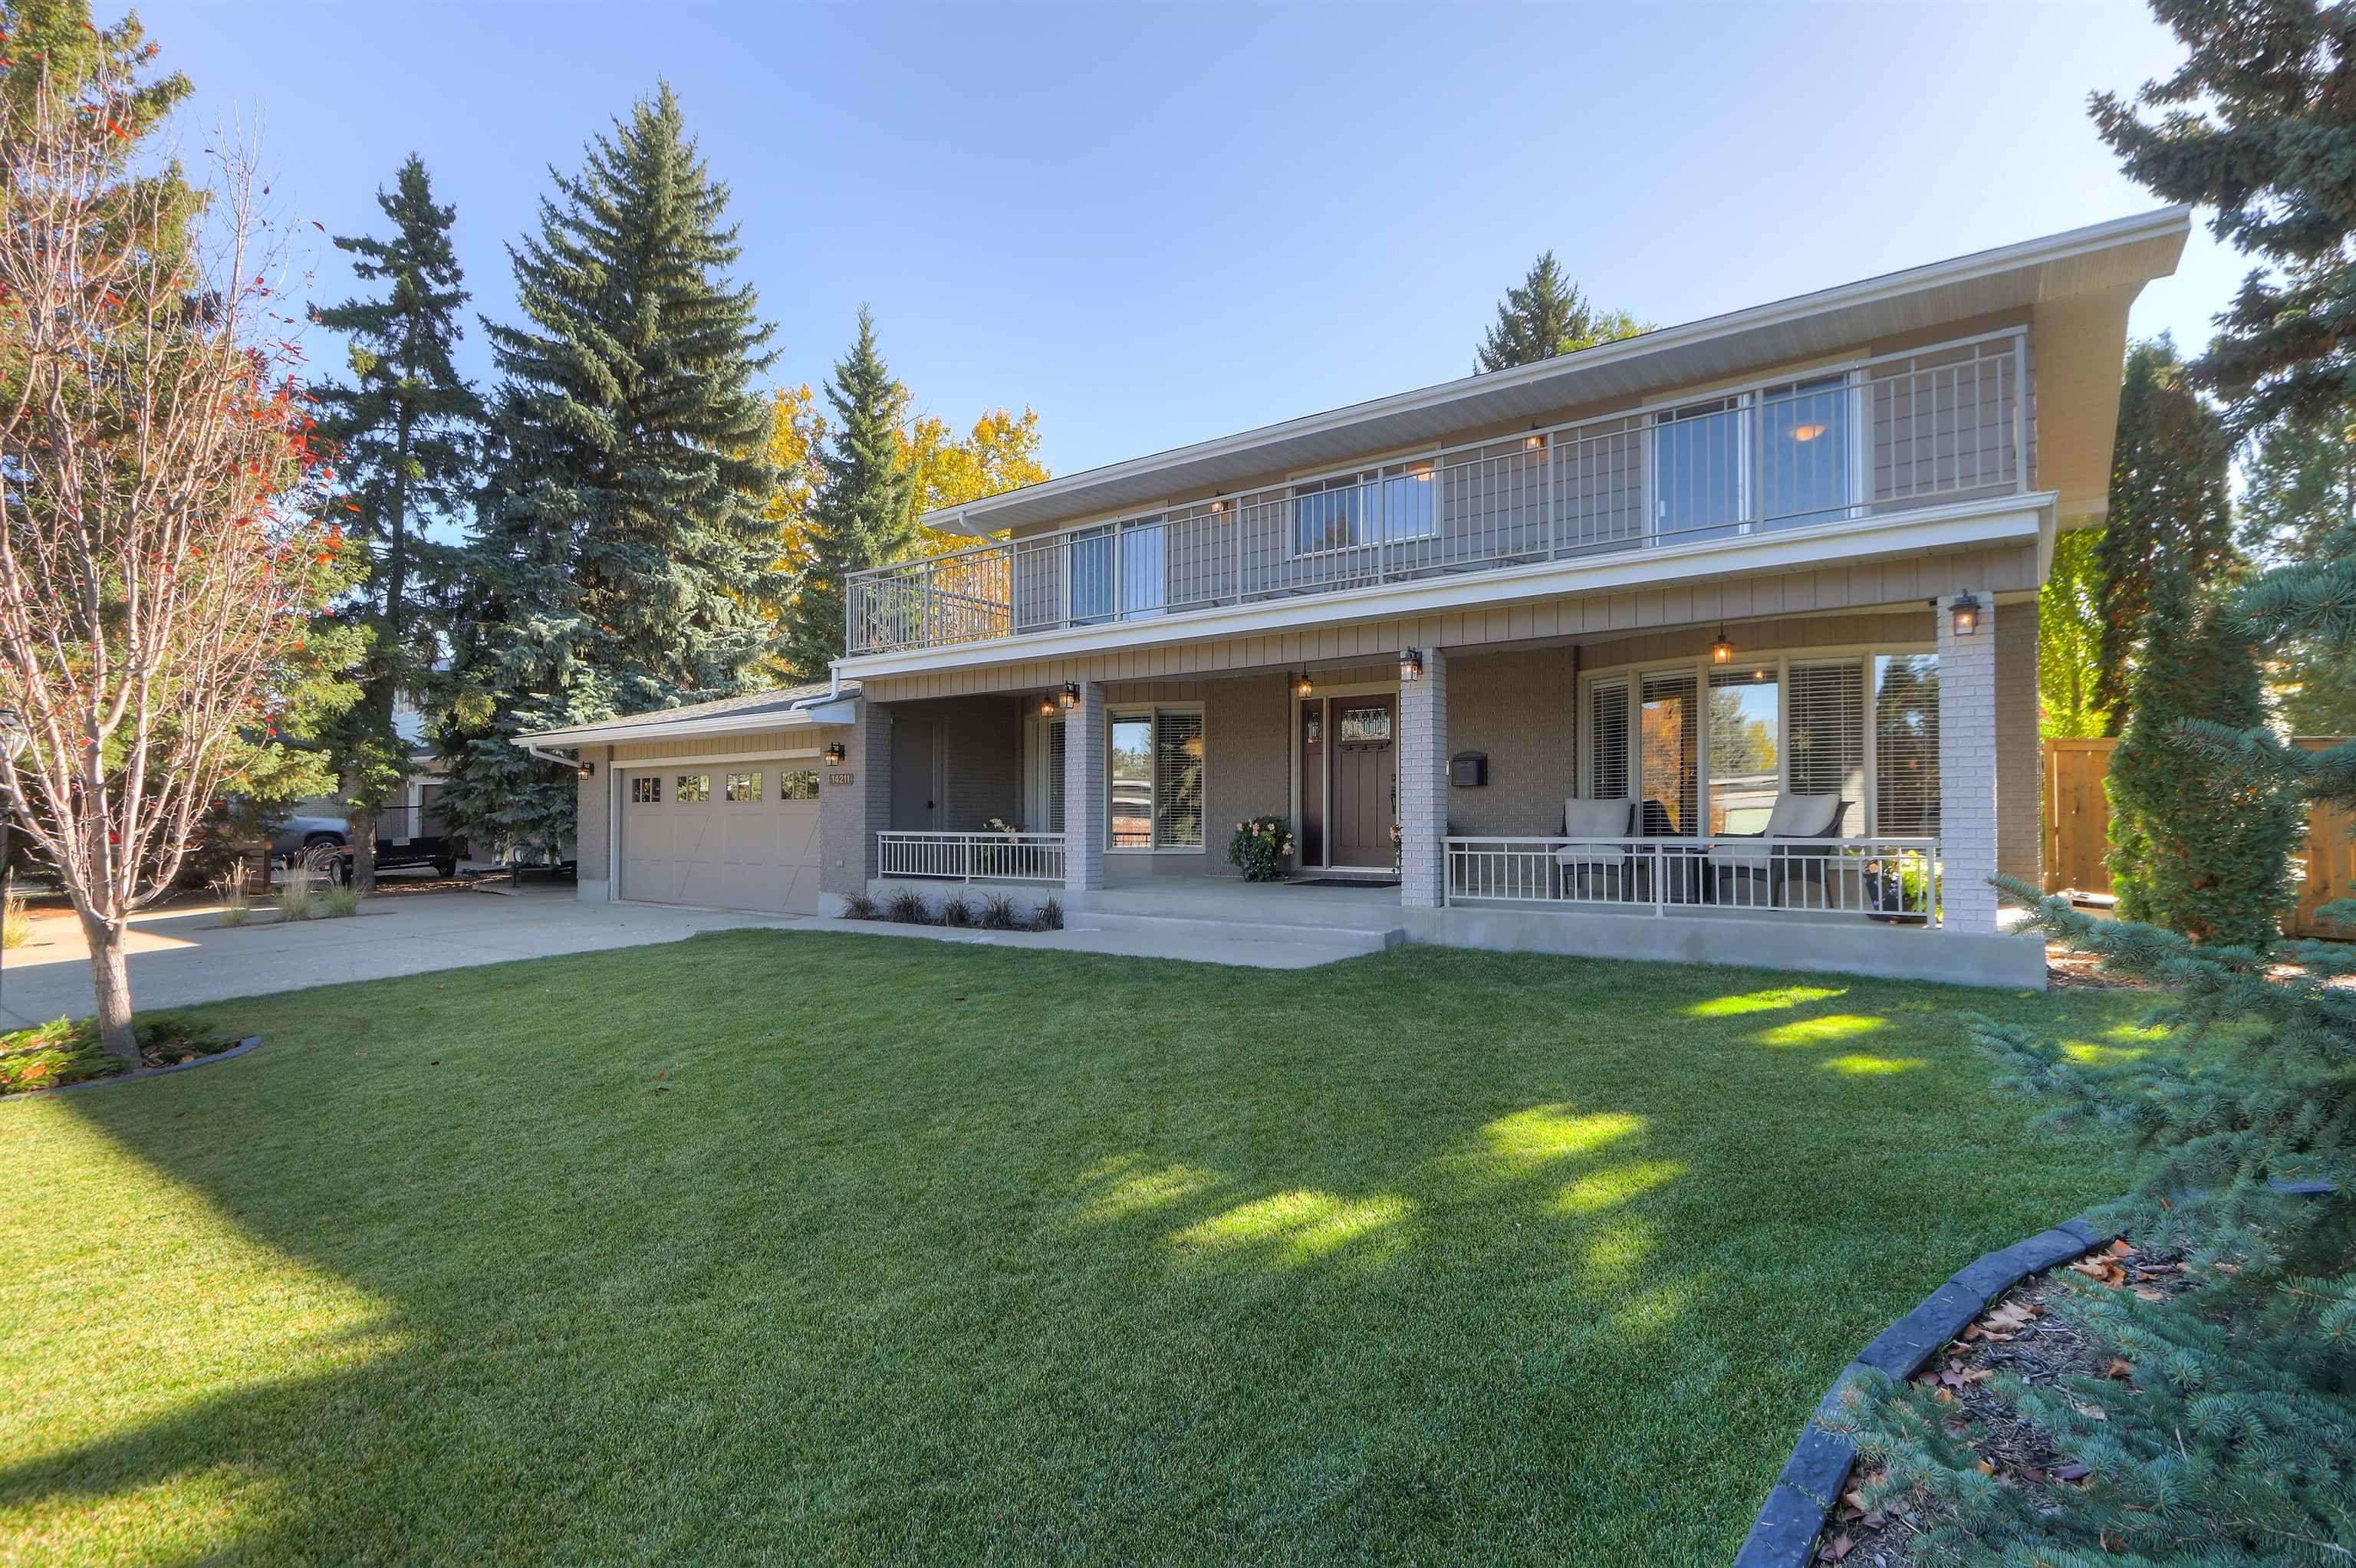 Main Photo: 14211 60 Avenue in Edmonton: Zone 14 House for sale : MLS®# E4266211